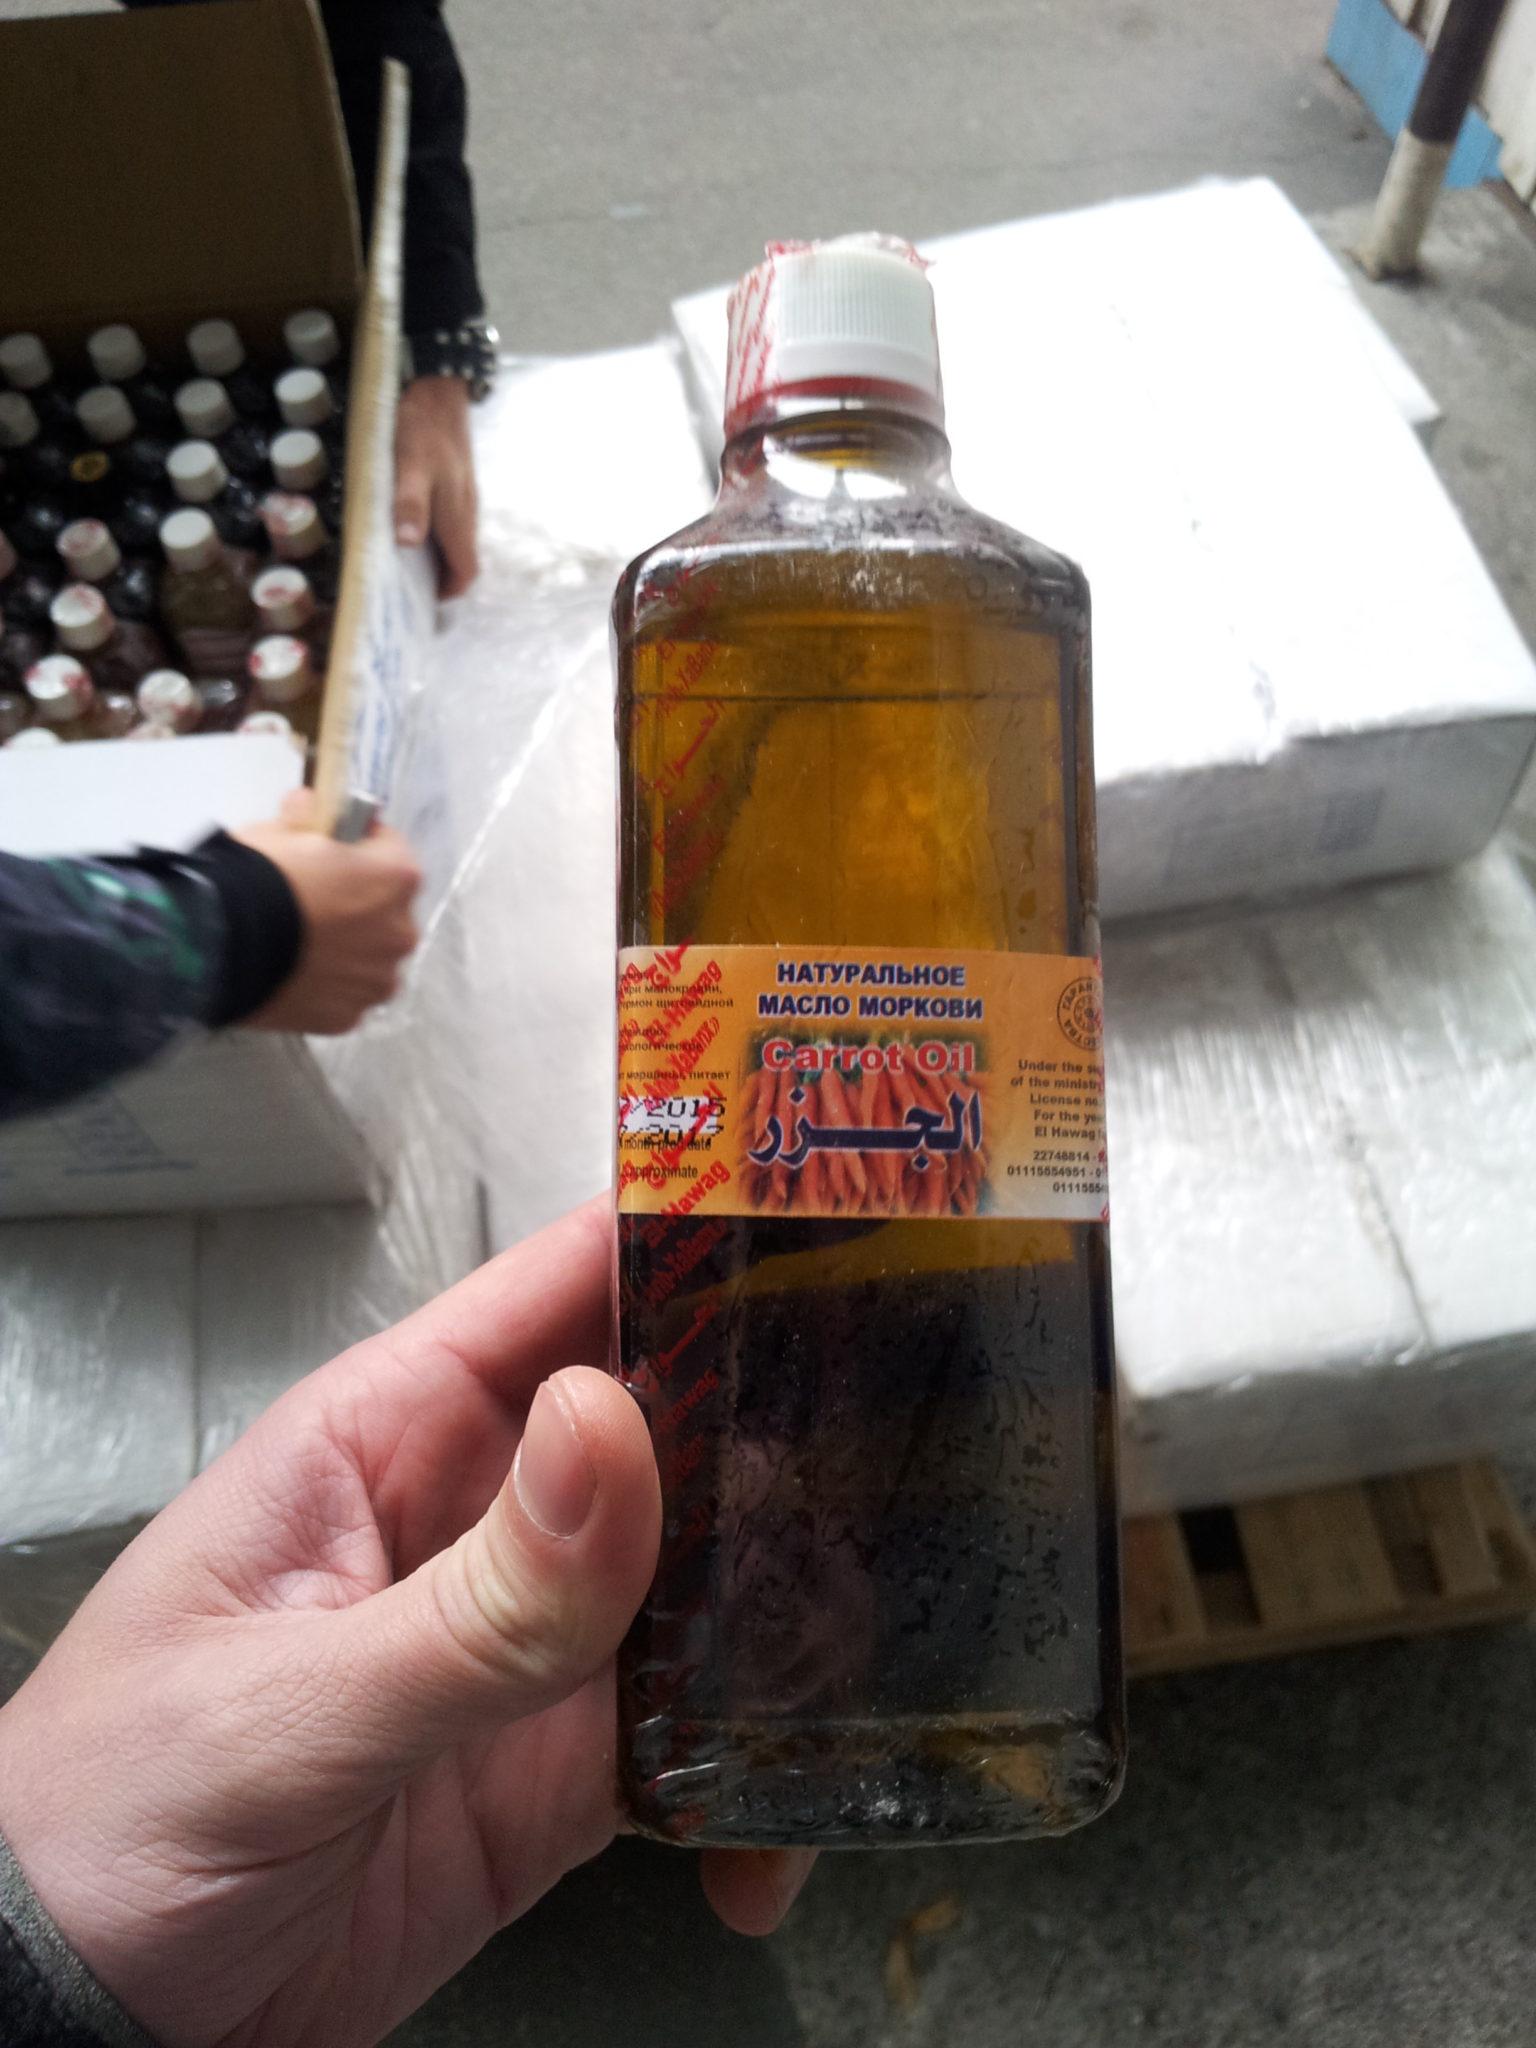 Масло Моркови - Борисполь